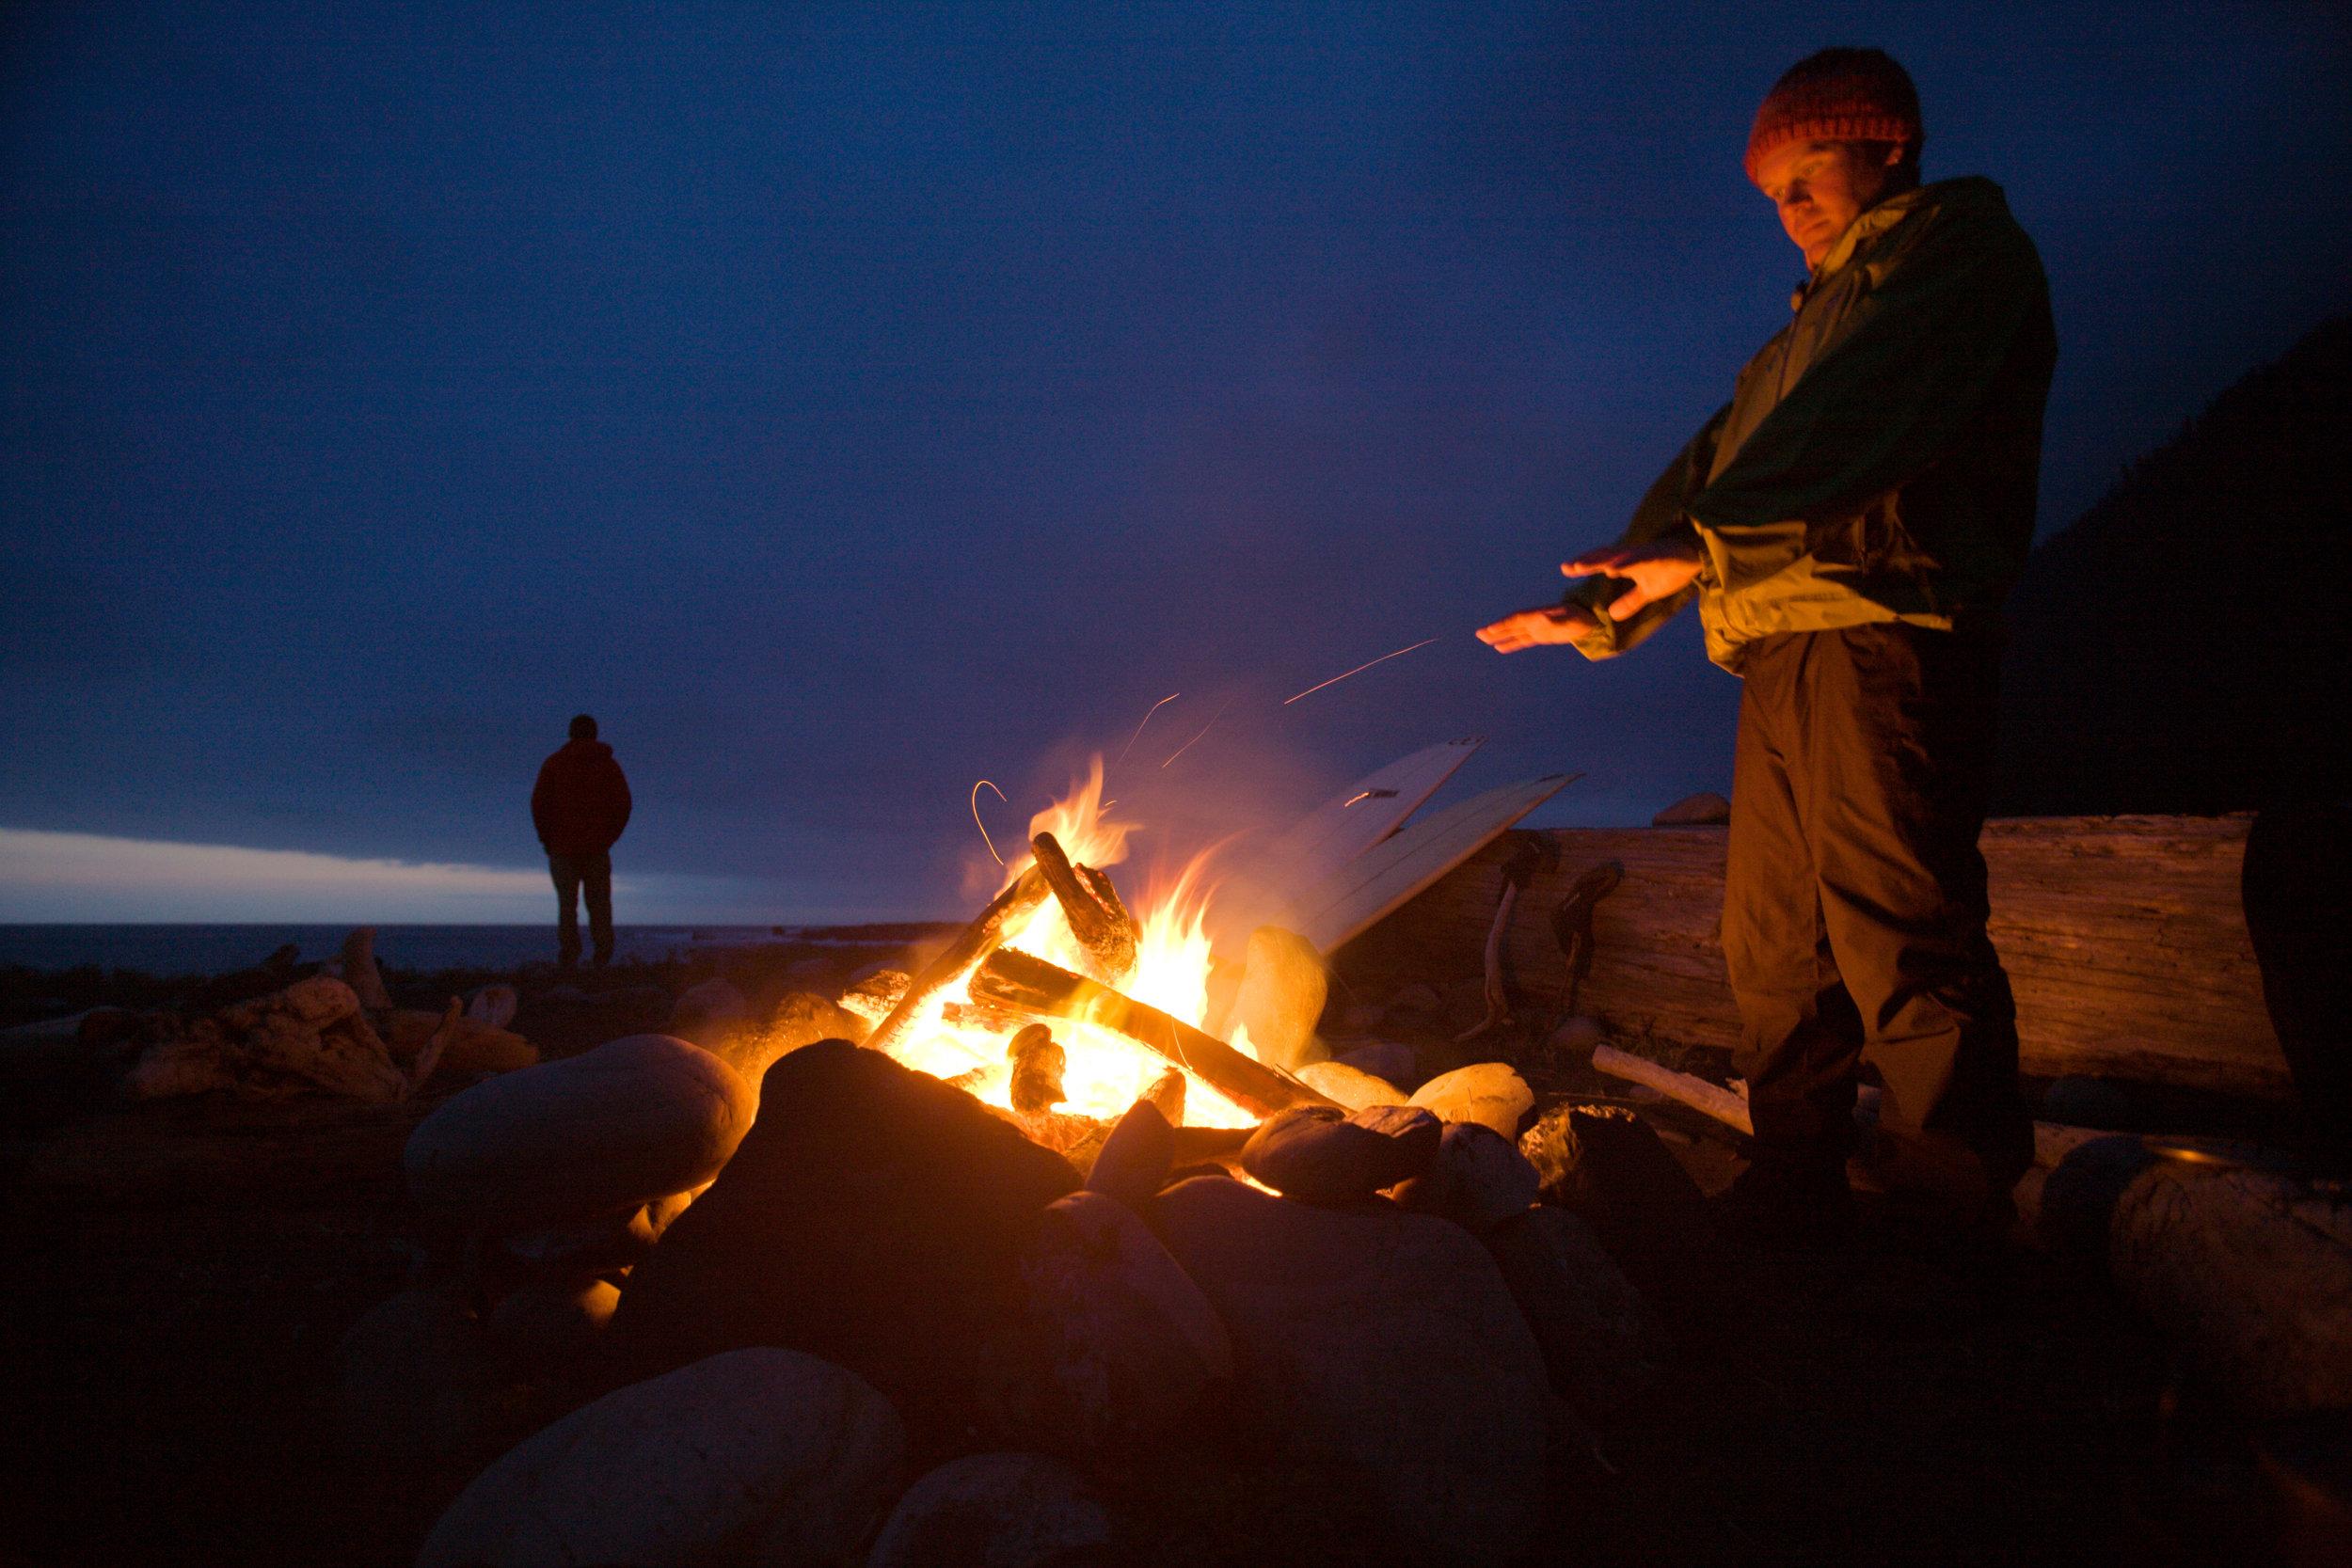 Dan Duane & Jeff Daniel — The Lost Coast, California